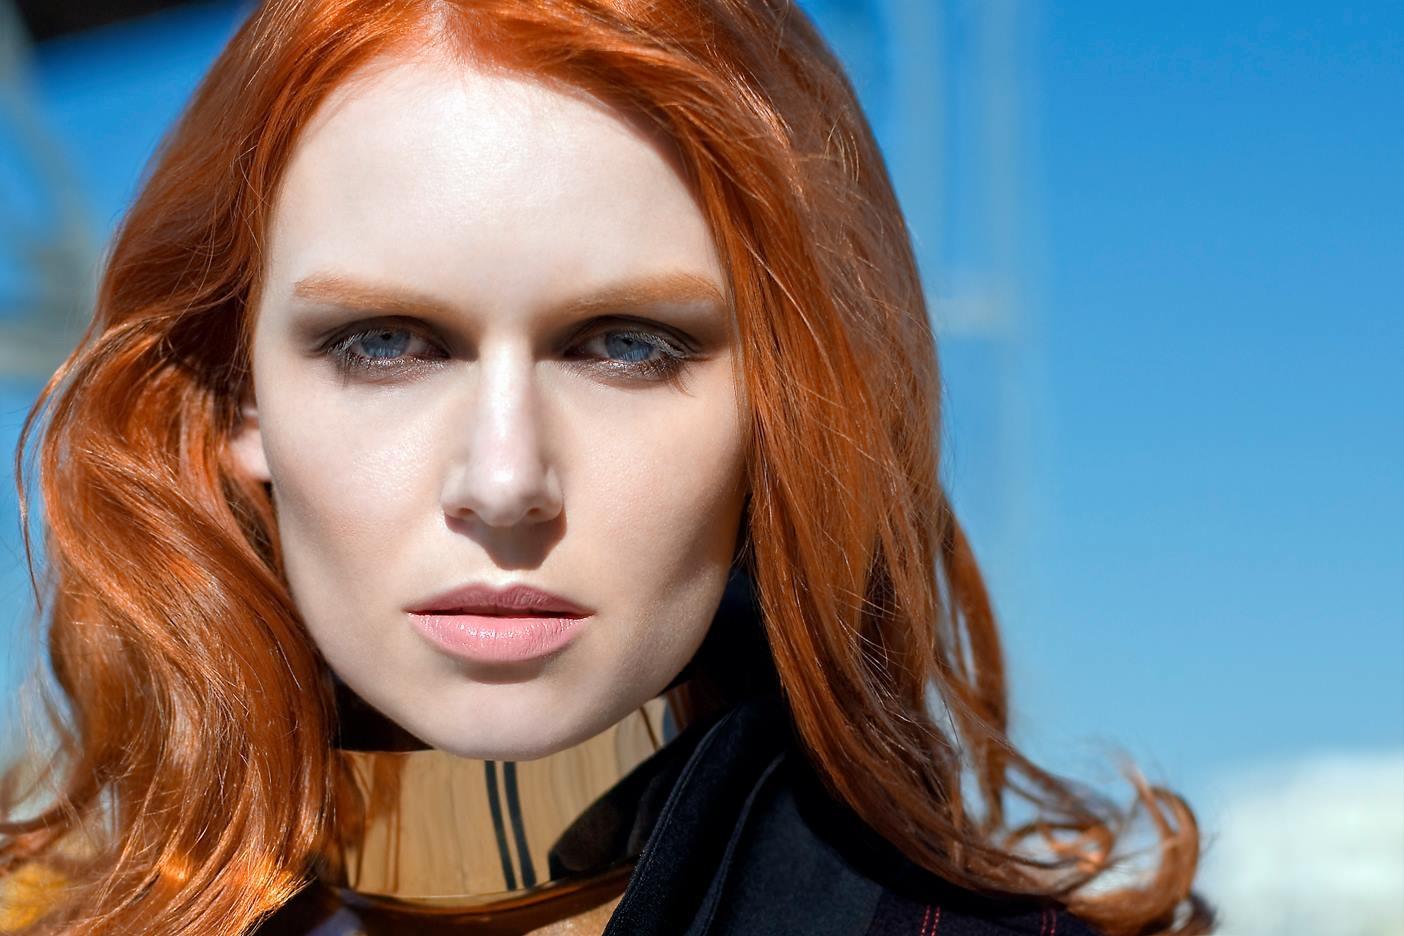 Dimitrios Ordoulidis Fashion Designer Living Postcards The New Face Of Greece